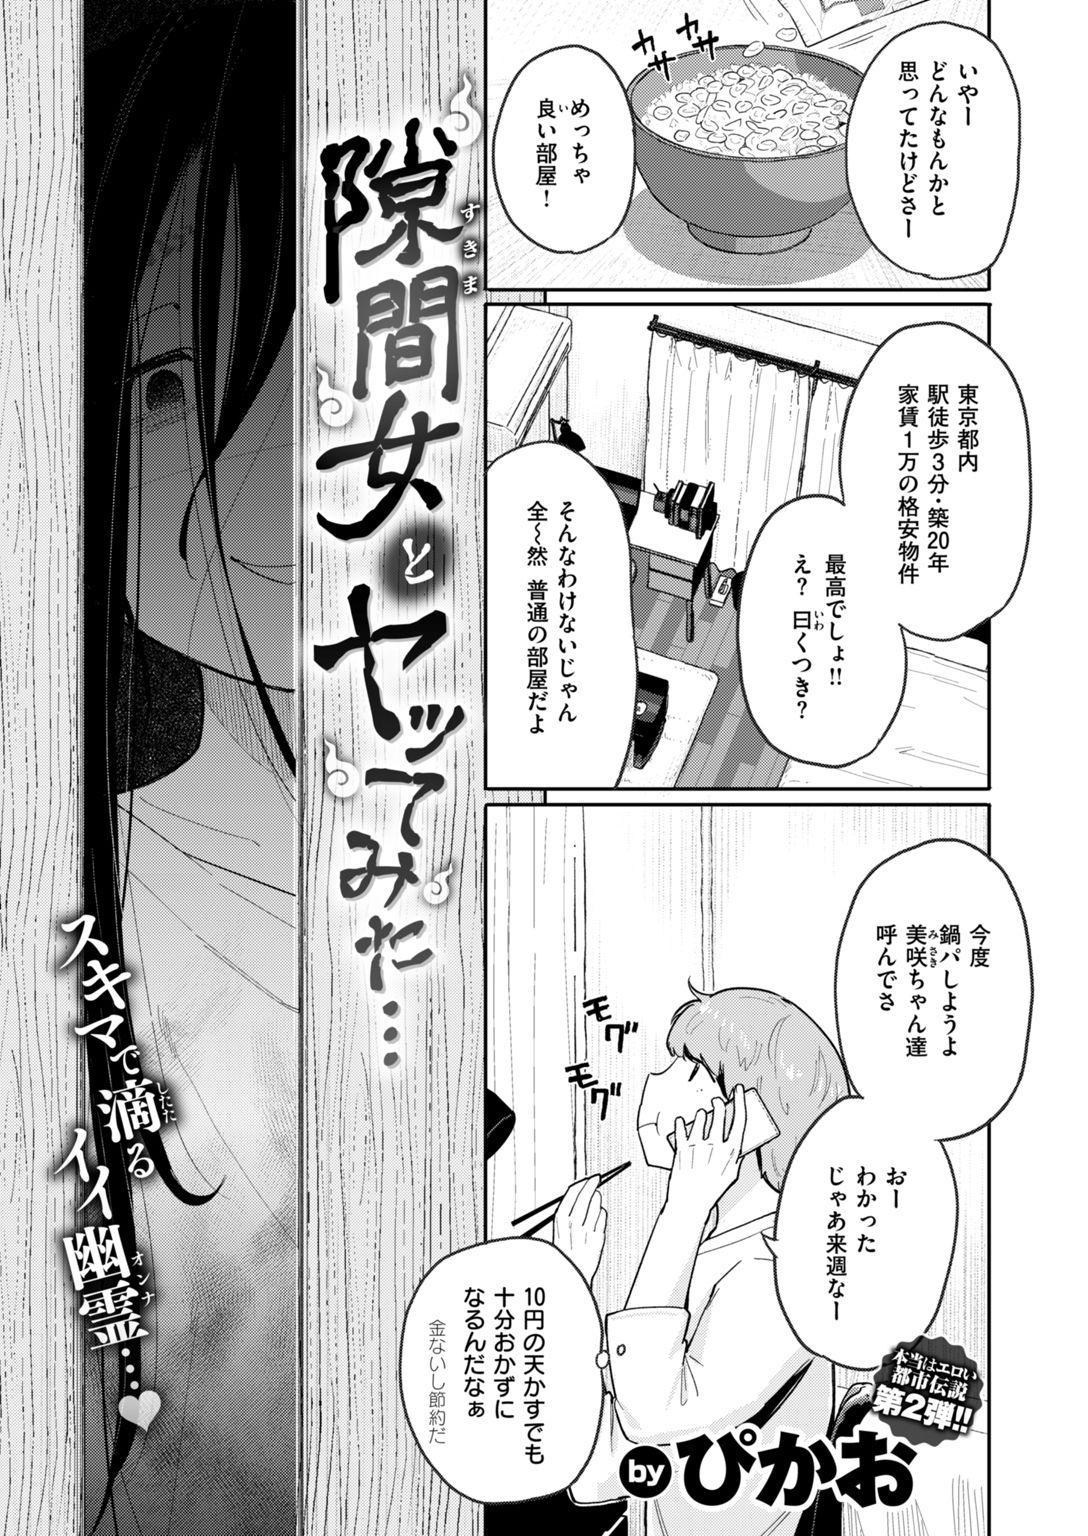 COMIC HAPPINING Vol. 2 81